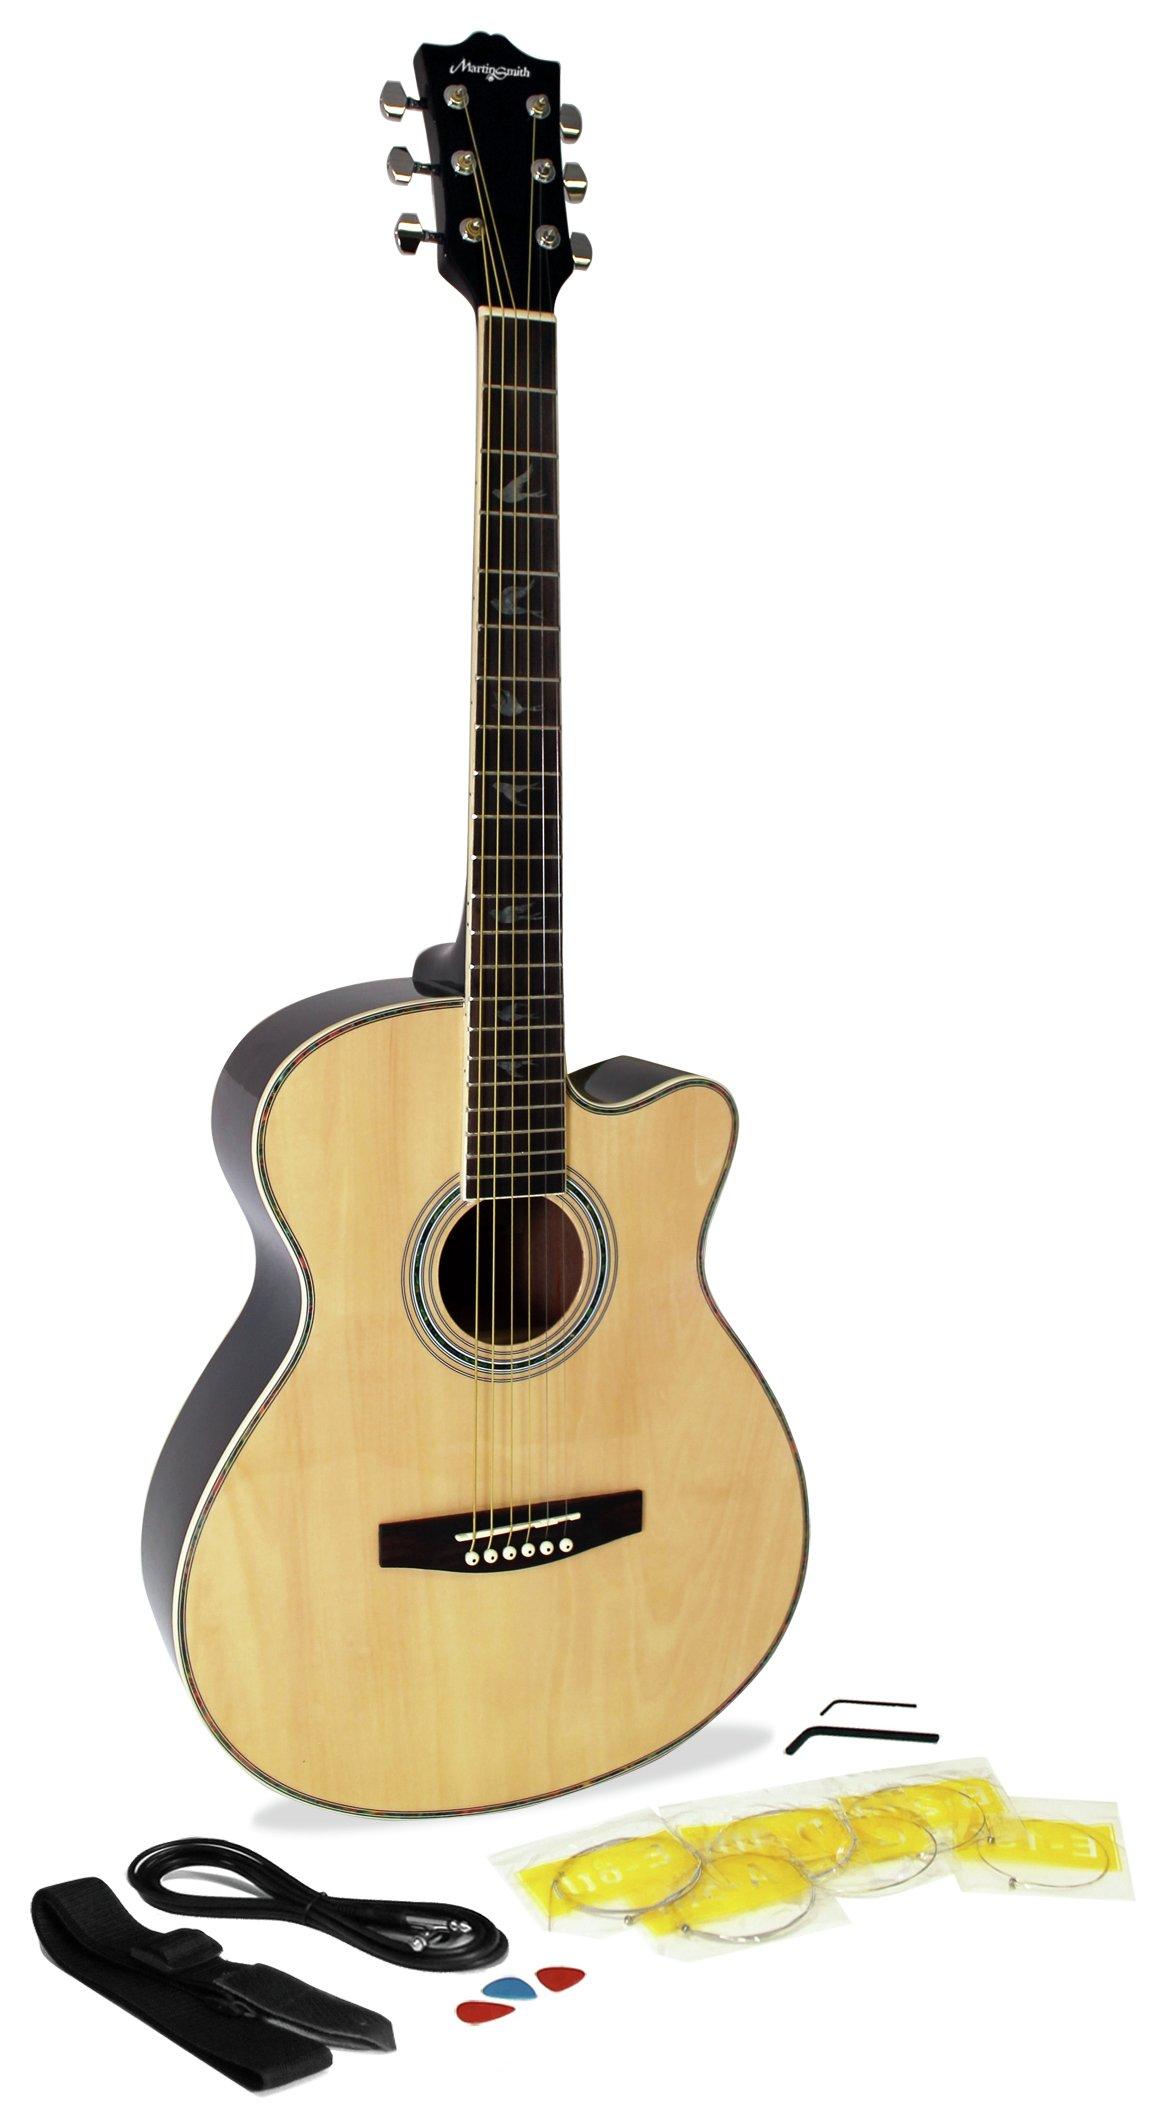 Martin Smith Natural Electro Acoustic Guitar 5711442 Argos Price Tracker Pricehistory Co Uk